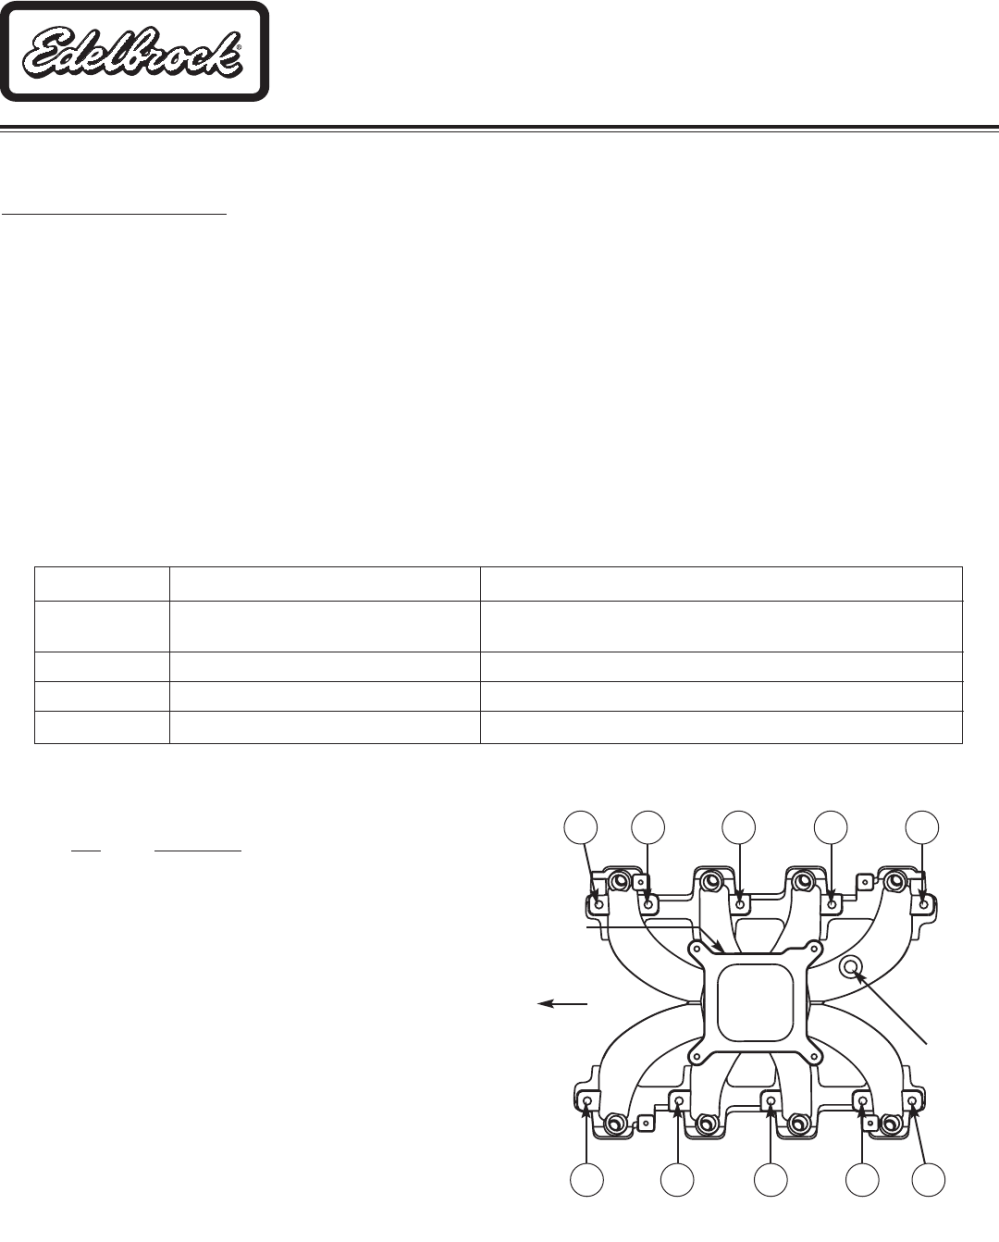 medium resolution of edelbrock ls1 controller wiring diagram